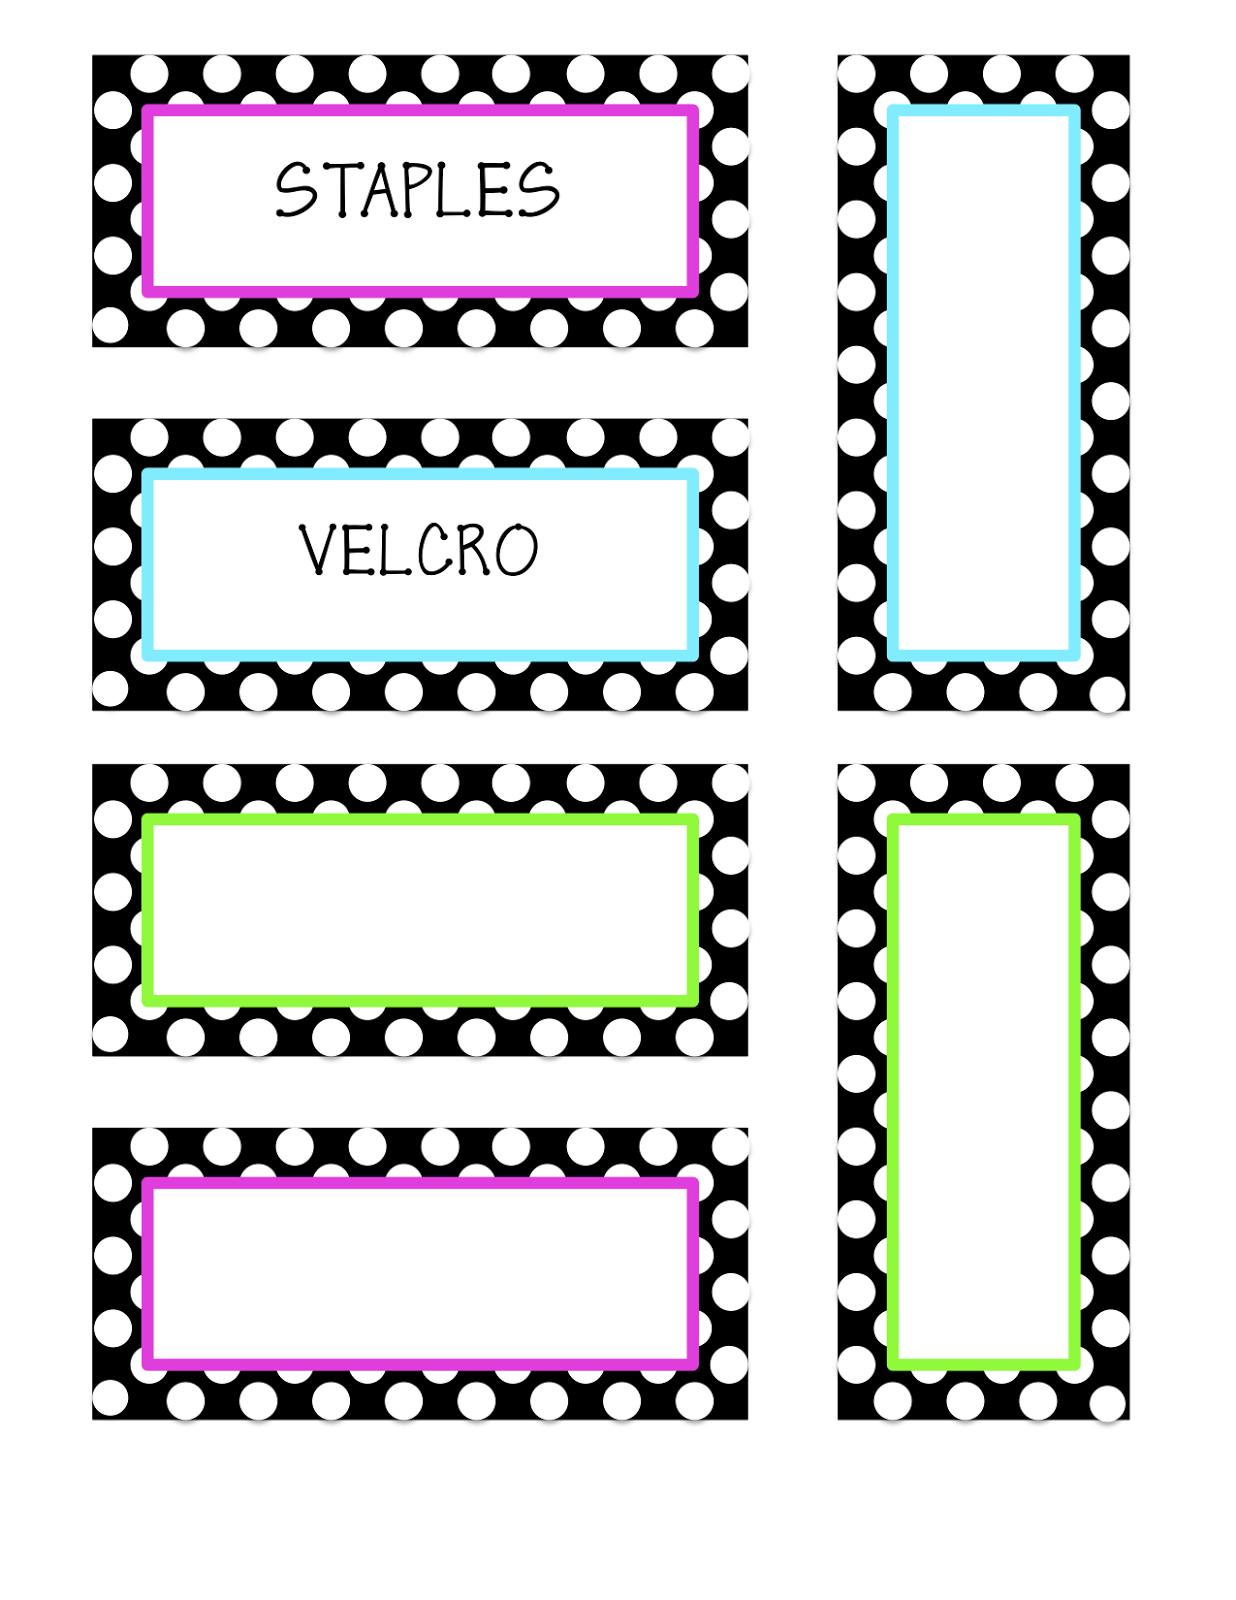 Free Classroom Decoration Templates ~ Classroom decor more teacher toolbox labels